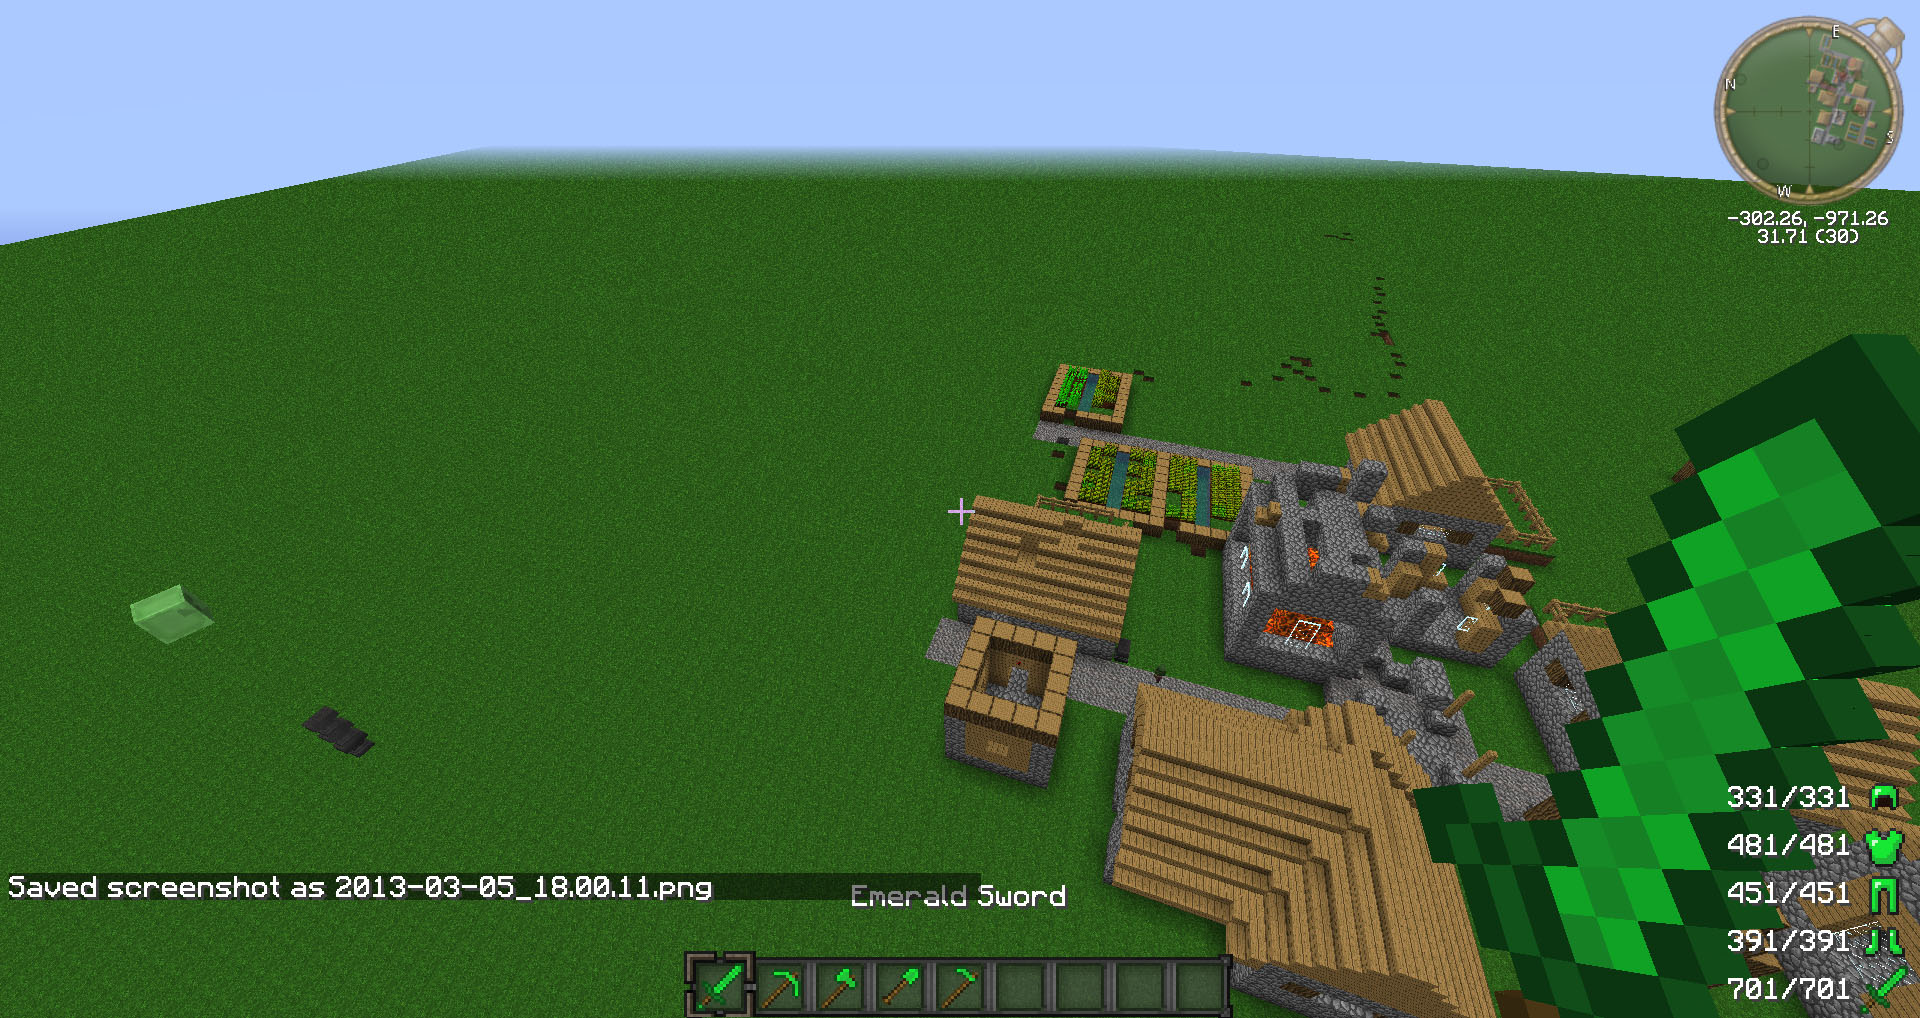 https://img2.9minecraft.net/Mod/Emerald-Tools-And-Armor-Mod-4.jpg